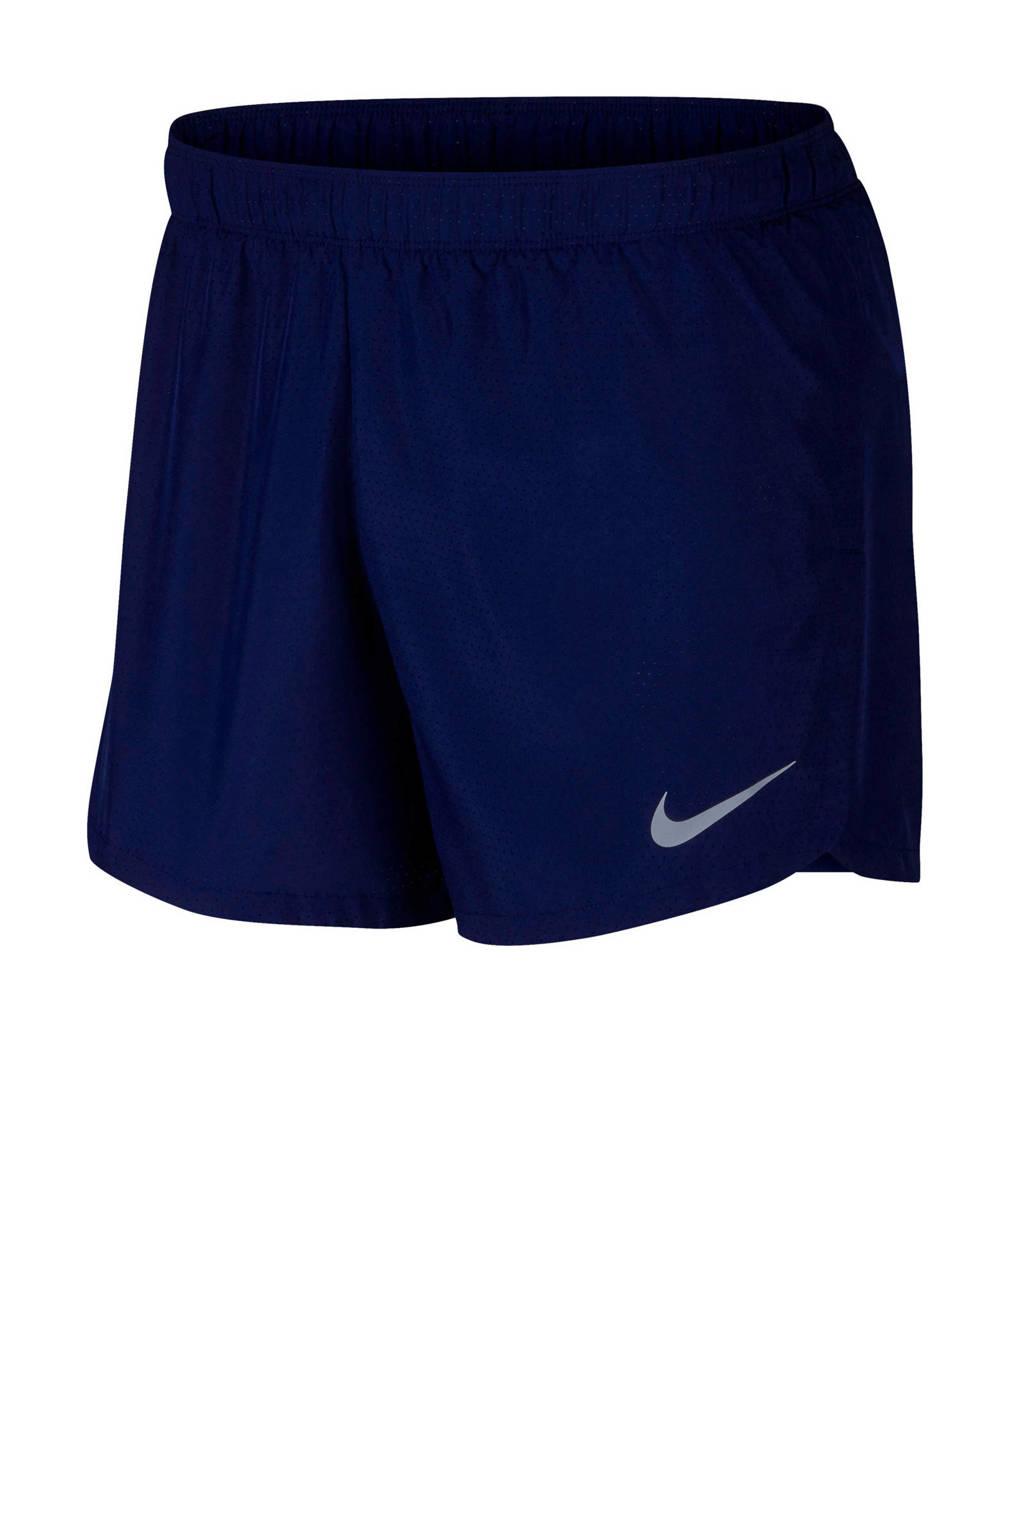 Nike   hardloopshort donkerblauw, Donkerblauw